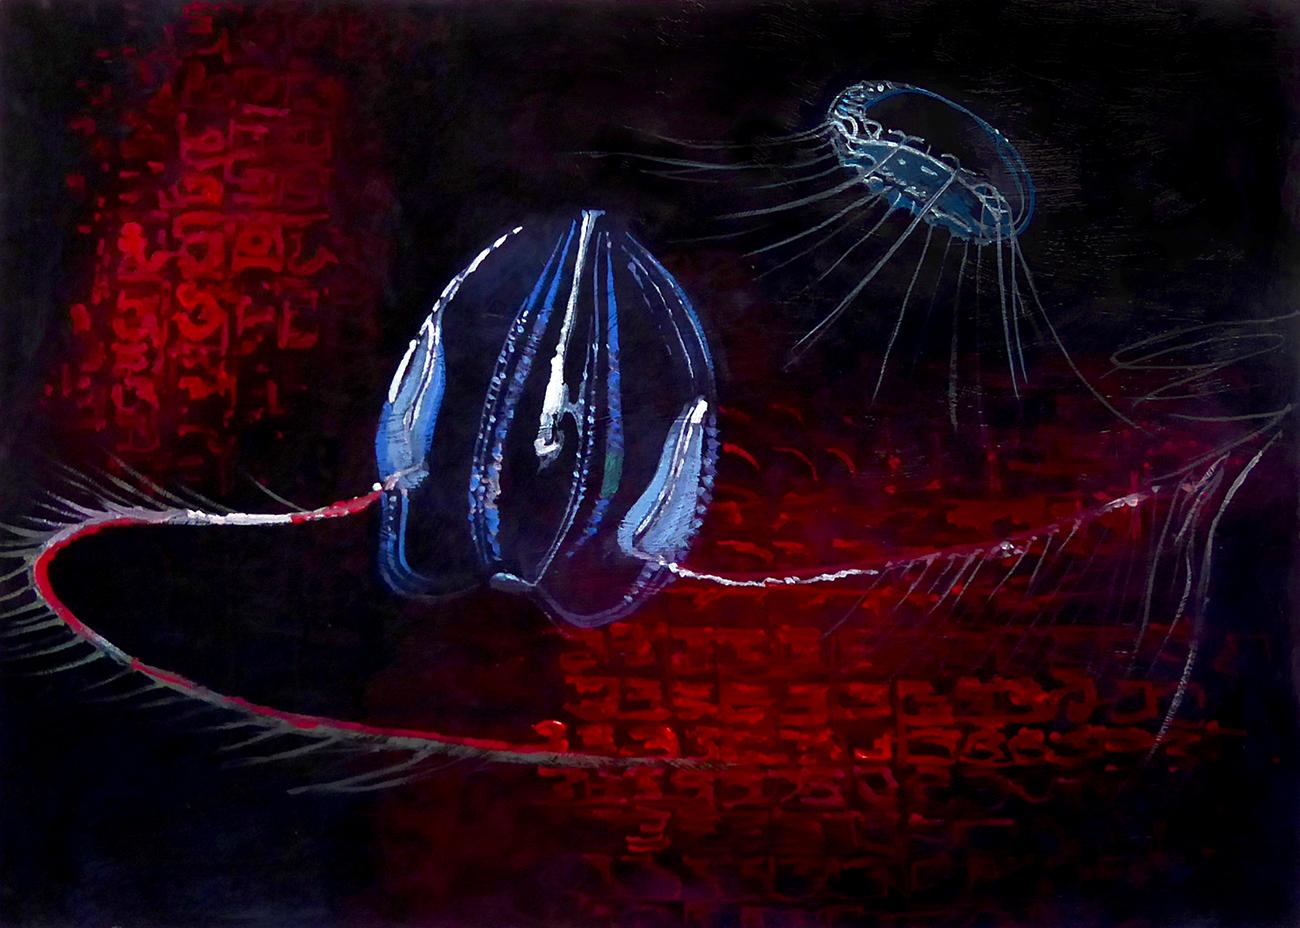 Many deep sea creatures produce bioluminescent light.